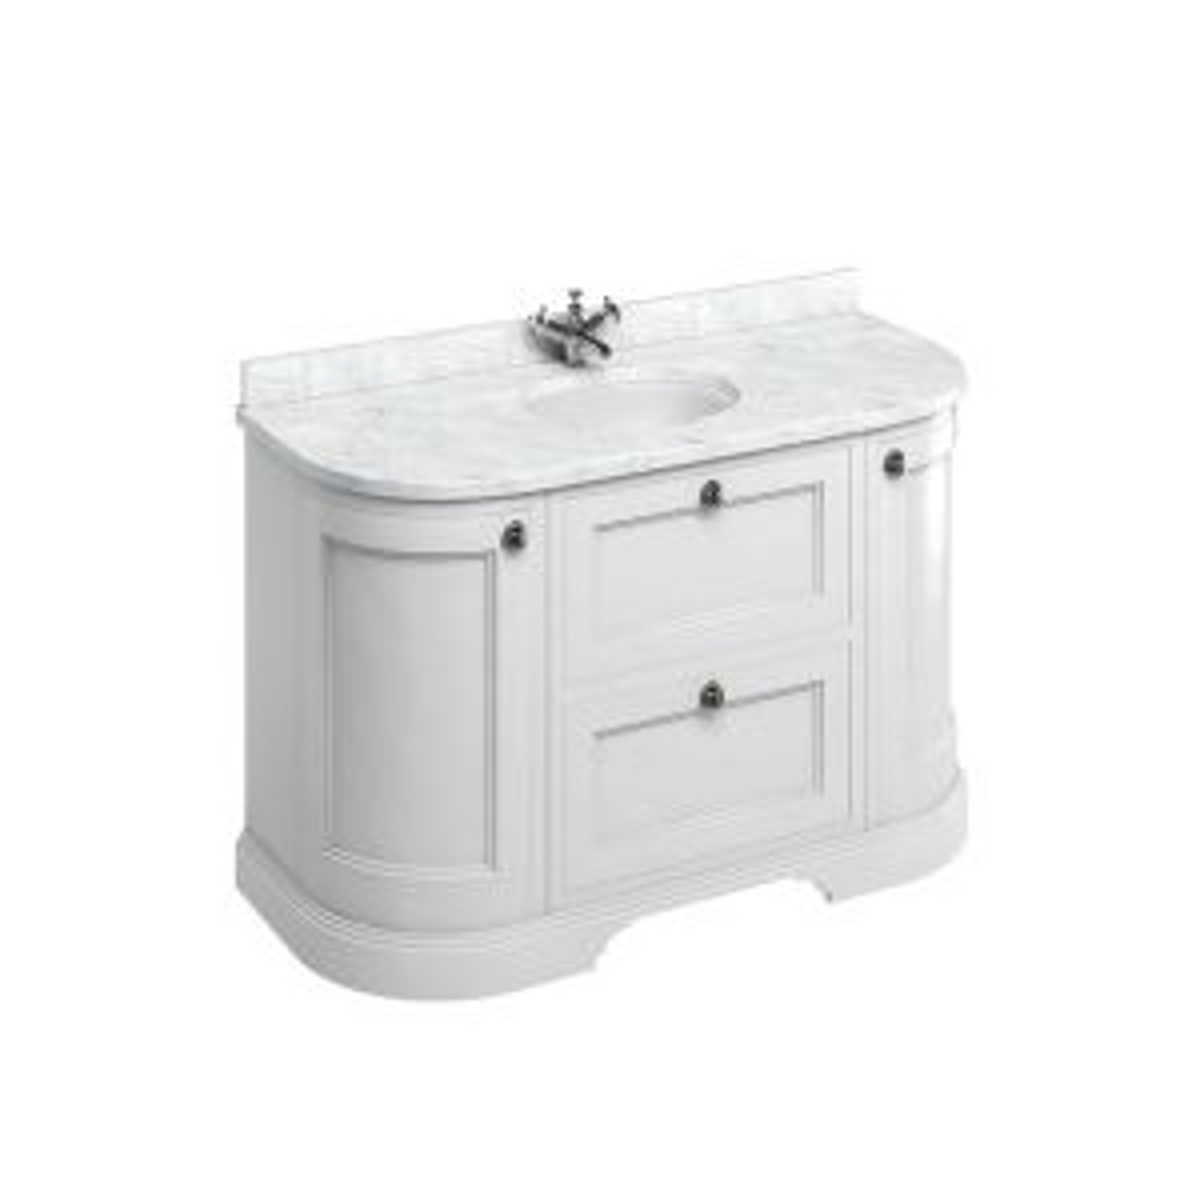 Burlington Matt White Freestanding Round Vanity Unit 1340mm Carrara White